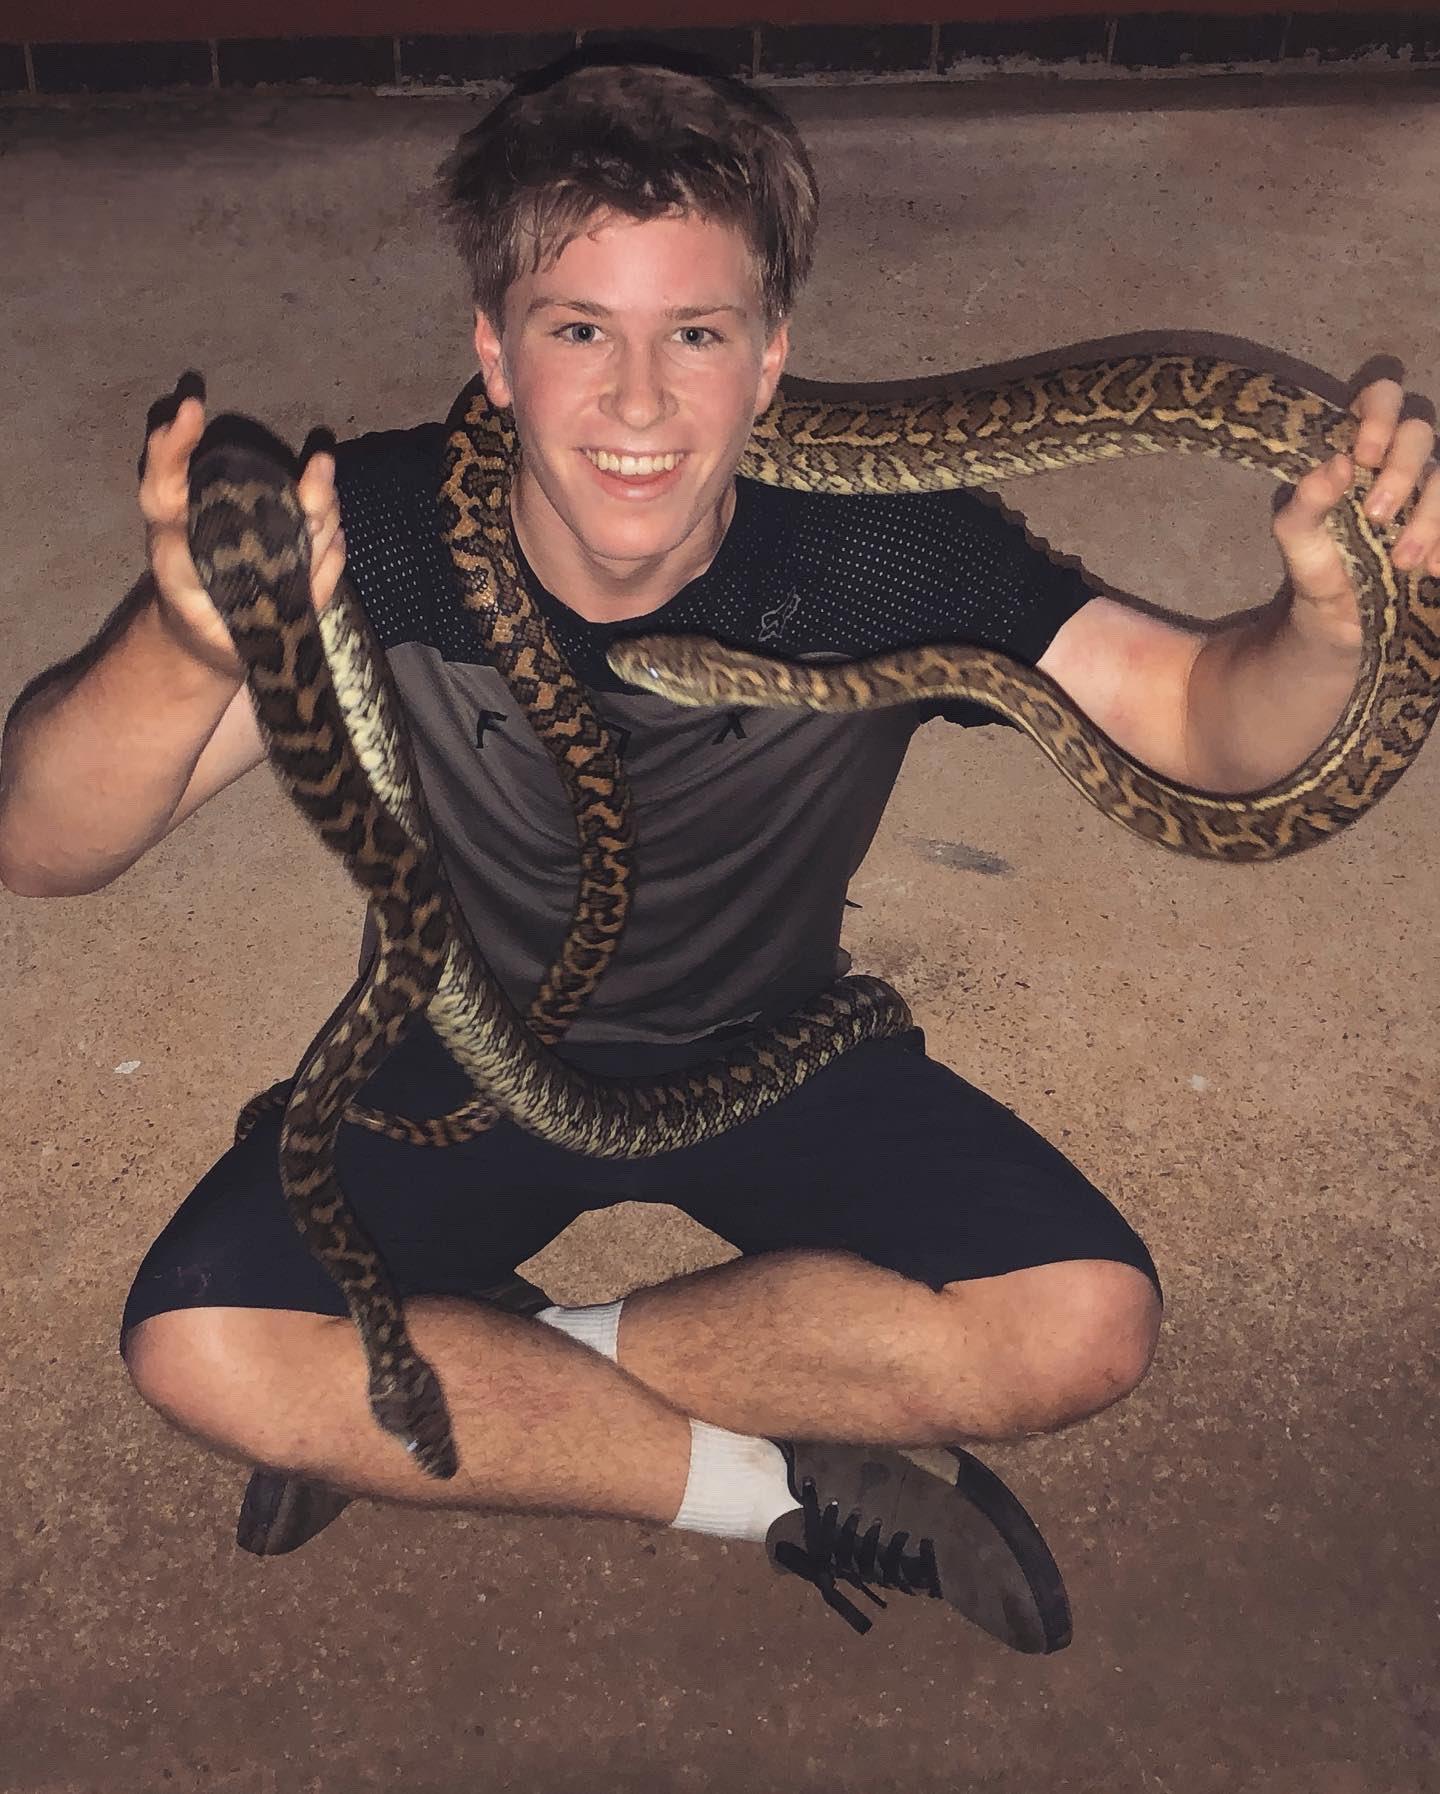 General photo of Robert Irwin